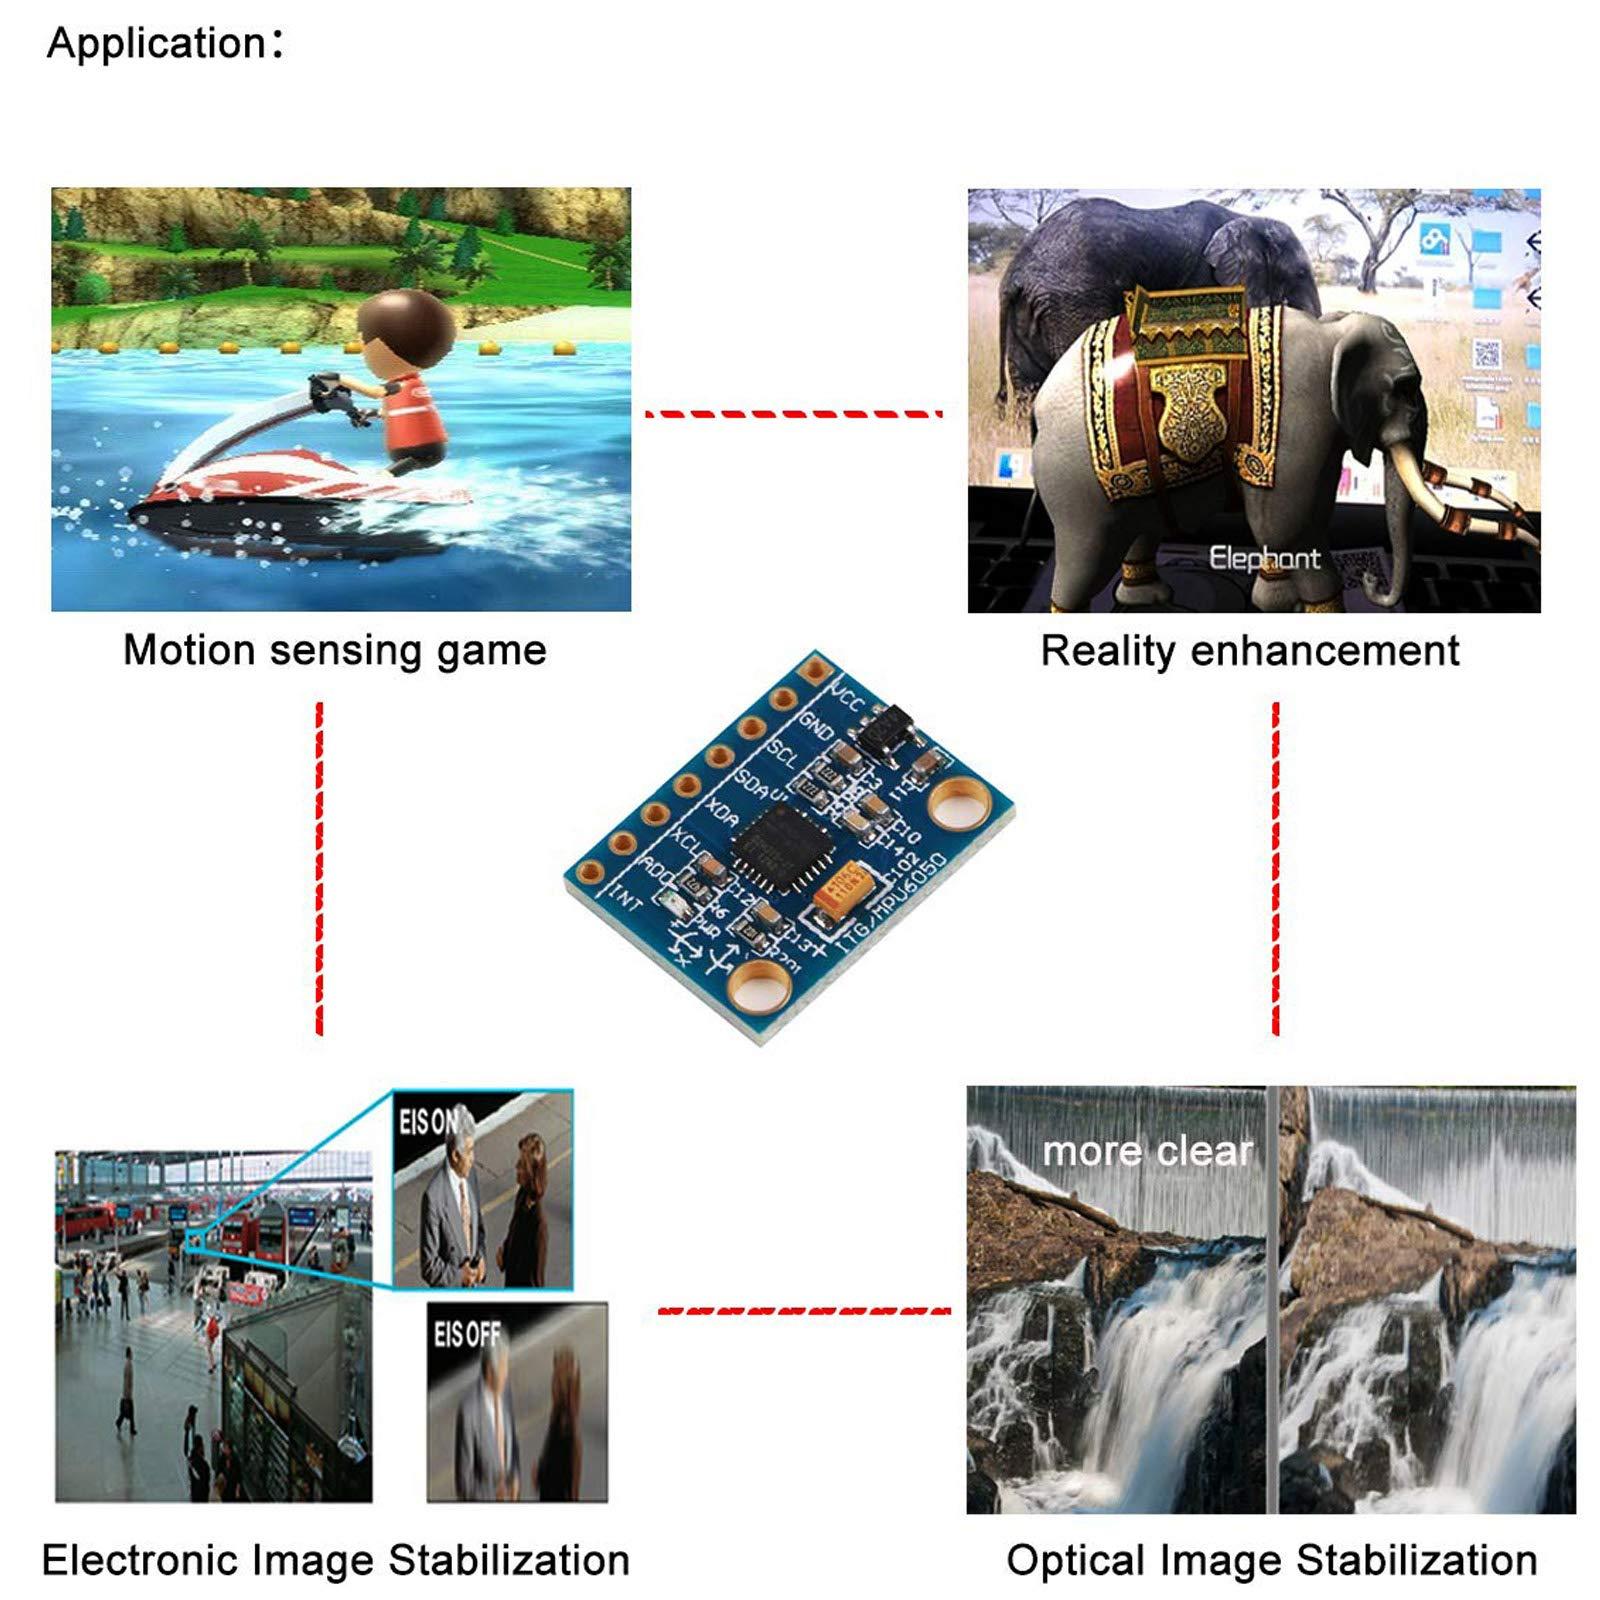 Gy-521 MPU-6050 MPU6050 Module 3 Axis Analog Gyro Sensors+ 3 Axis Accelerometer Module by Generic (Image #5)